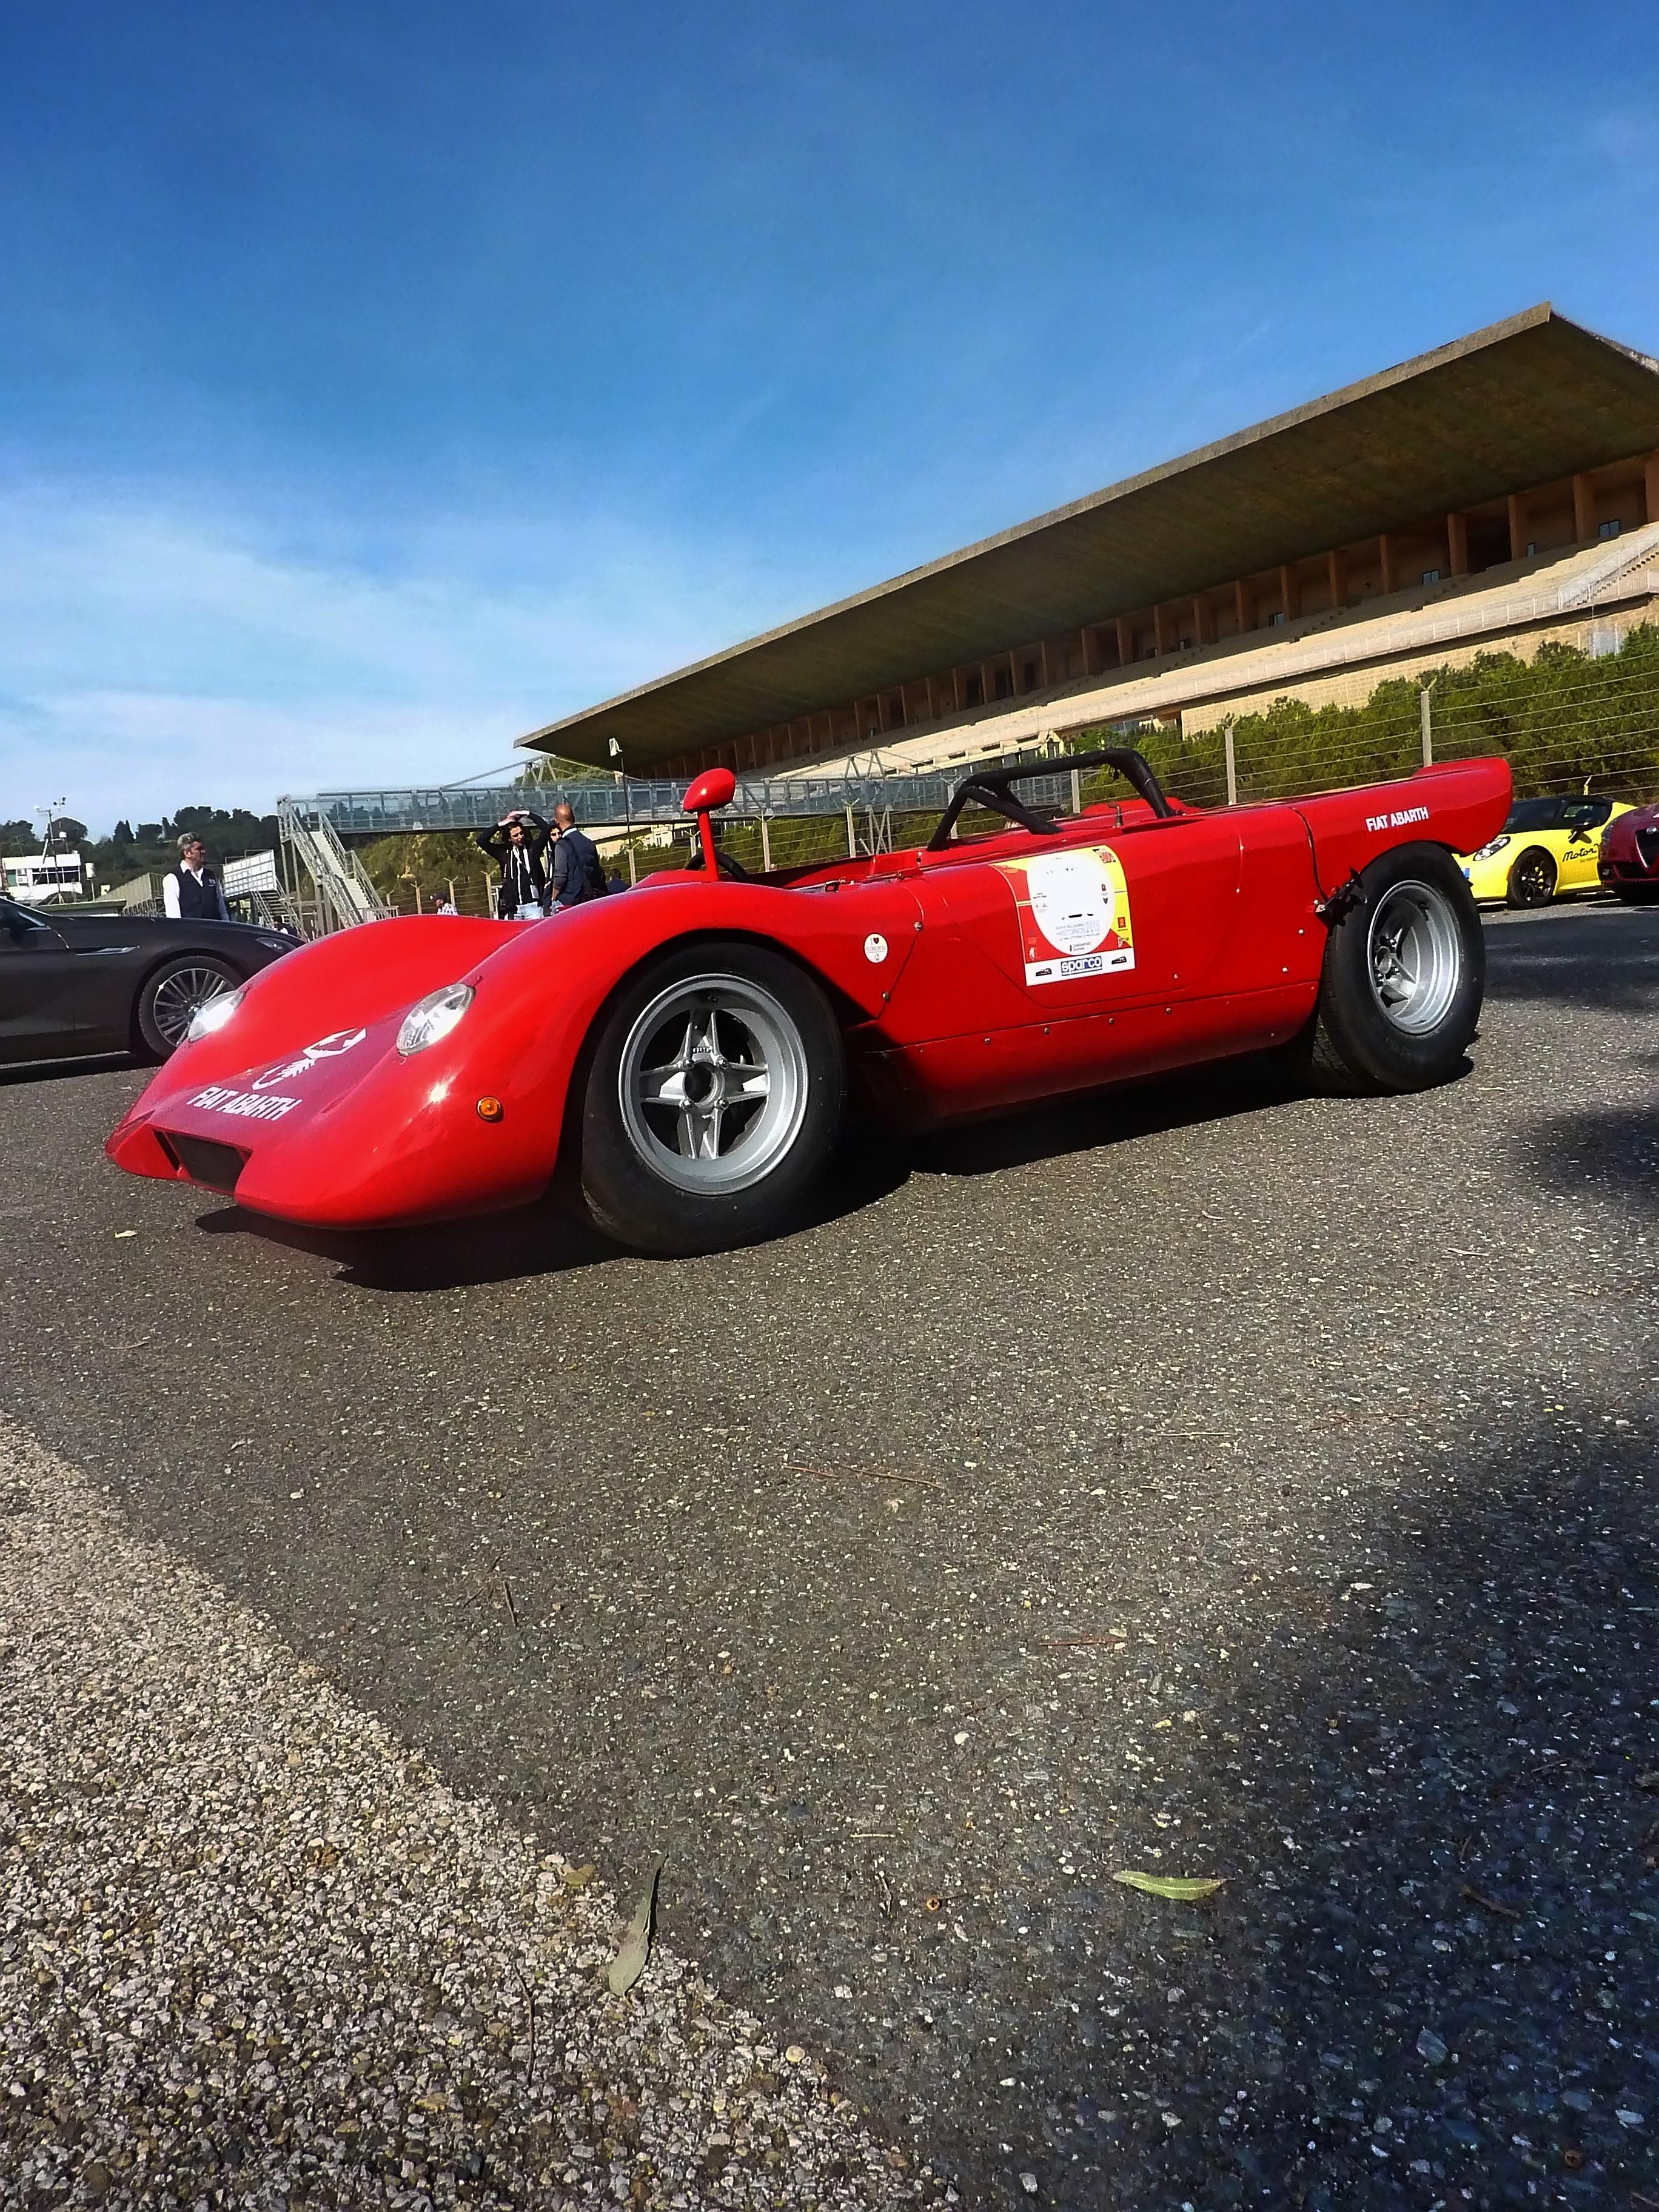 1971 Abarth 1300 SE 018 Biposto Cuneo (6)